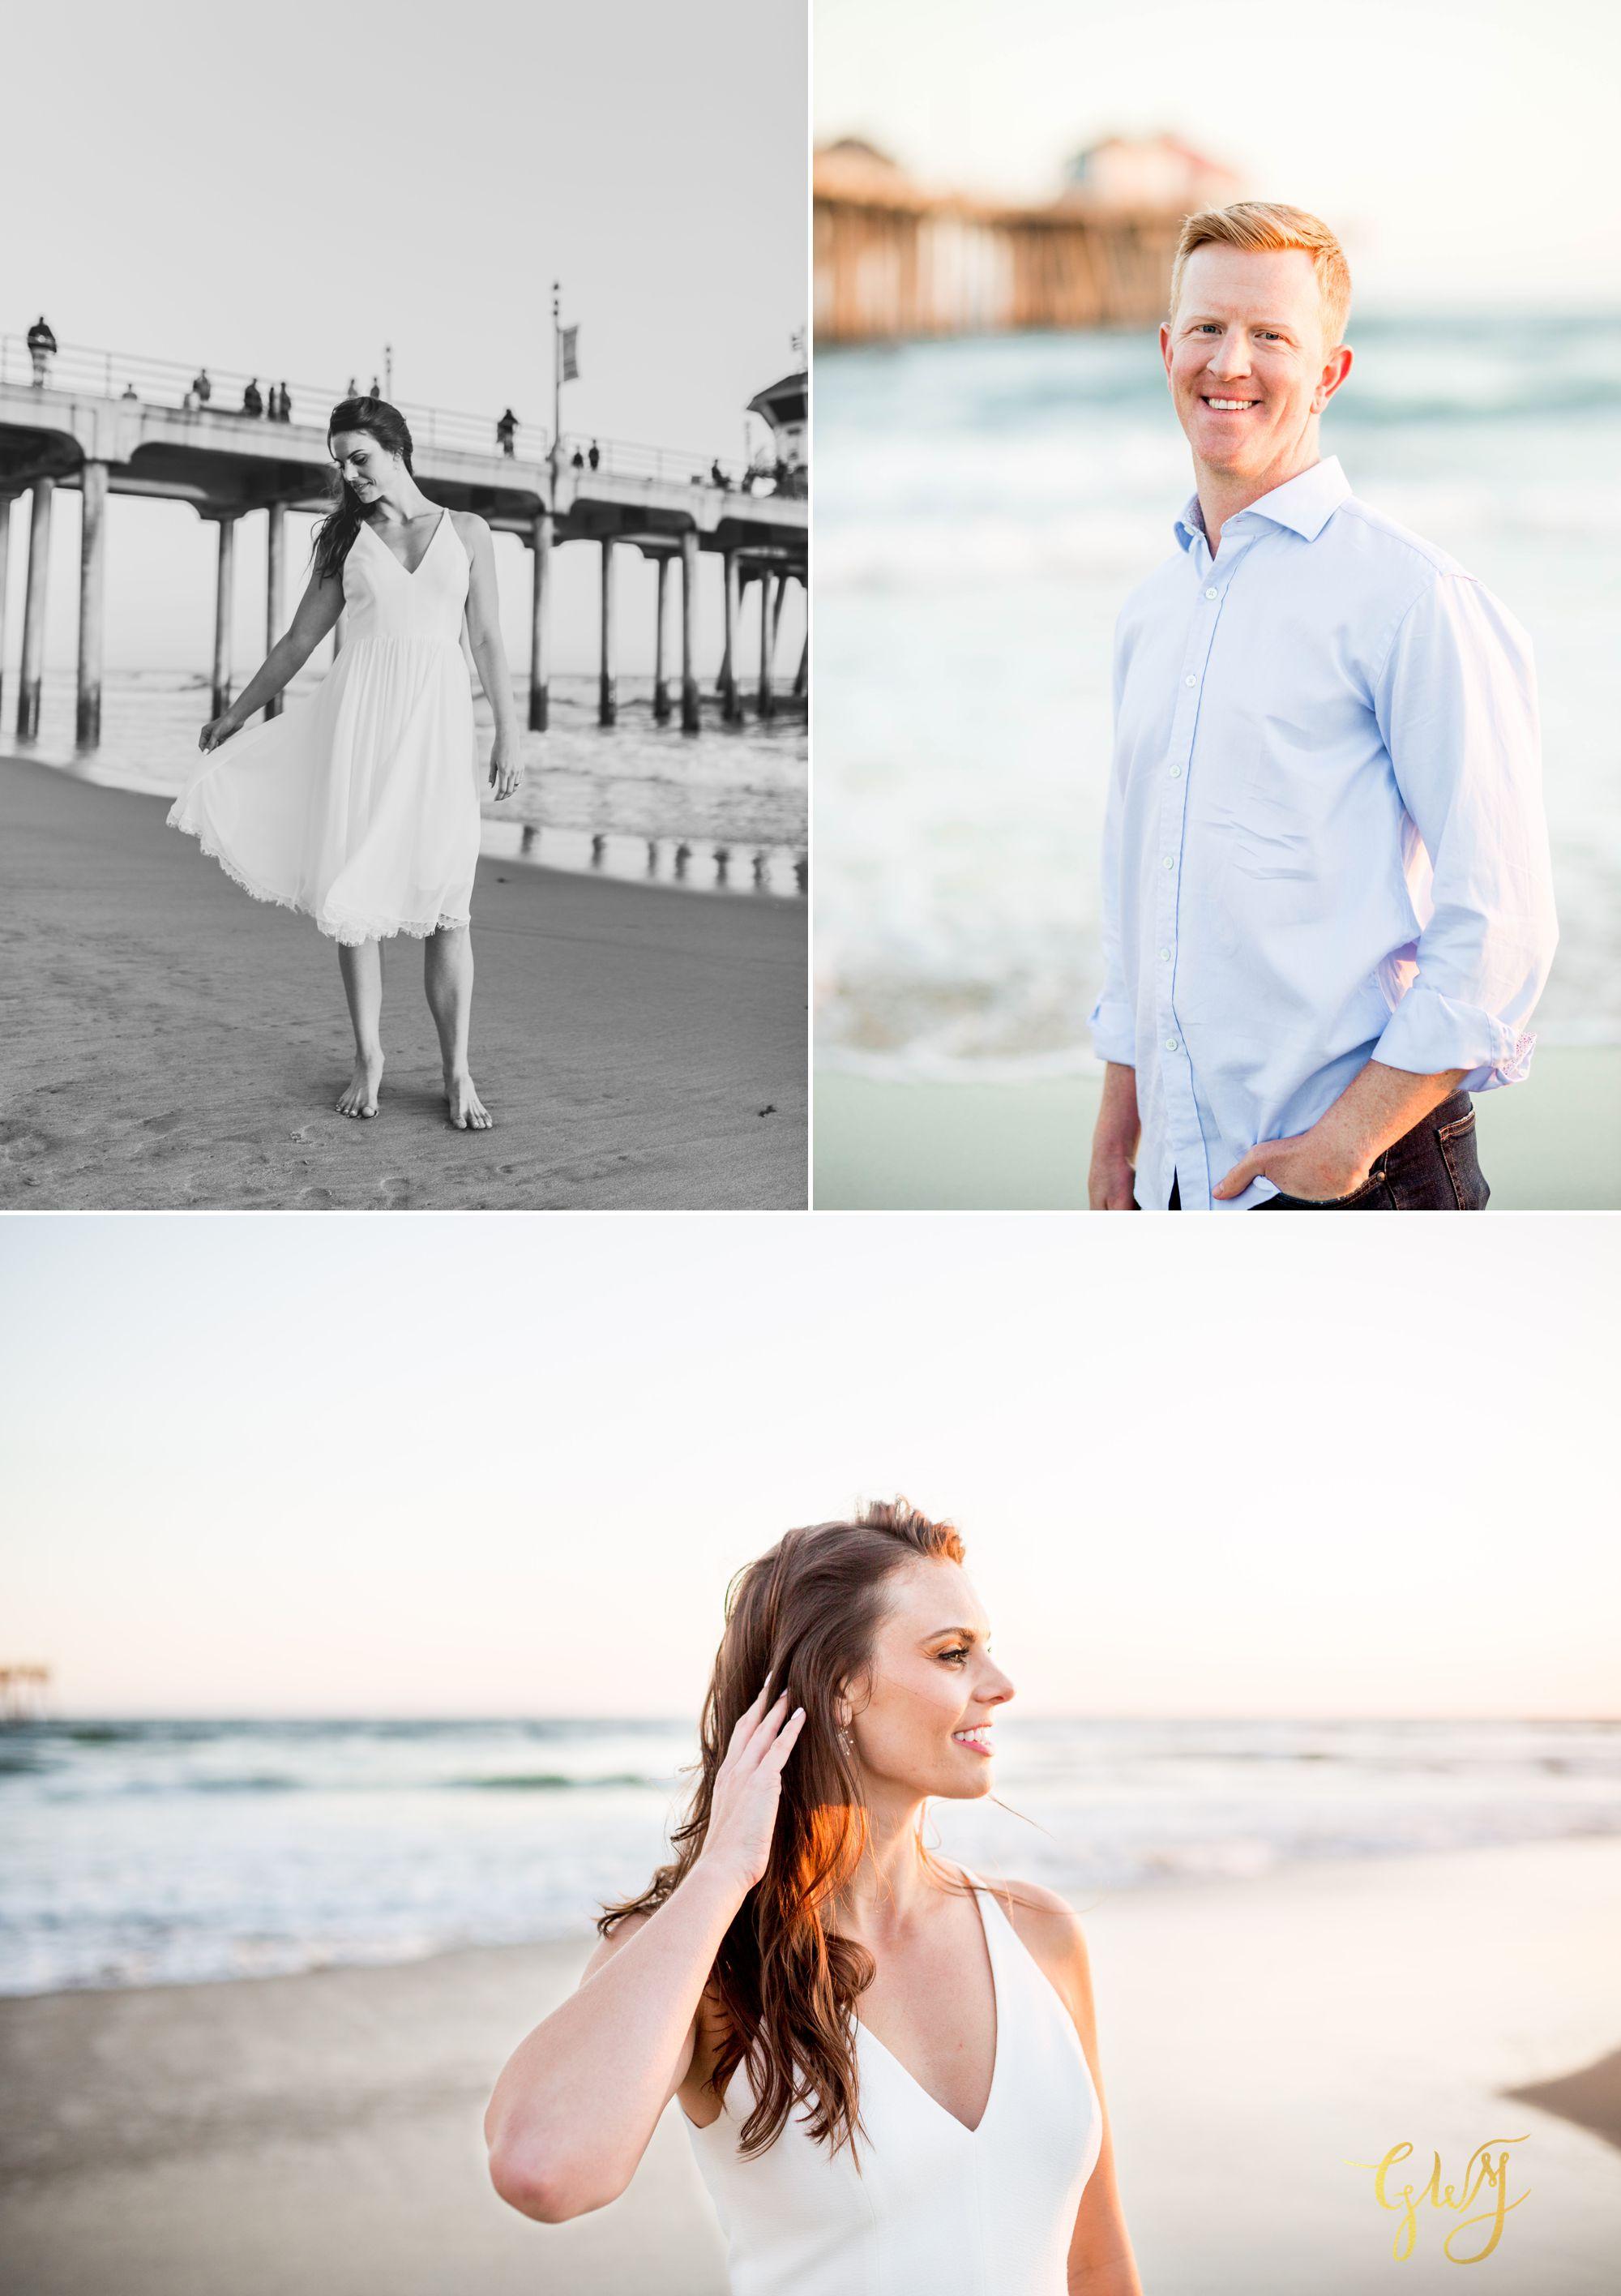 2019.05.27 - Ryley + Tolalf Romantic Summer Huntington Beach + HB Central Park Engagement Session by Glass Woods Media 15.jpg